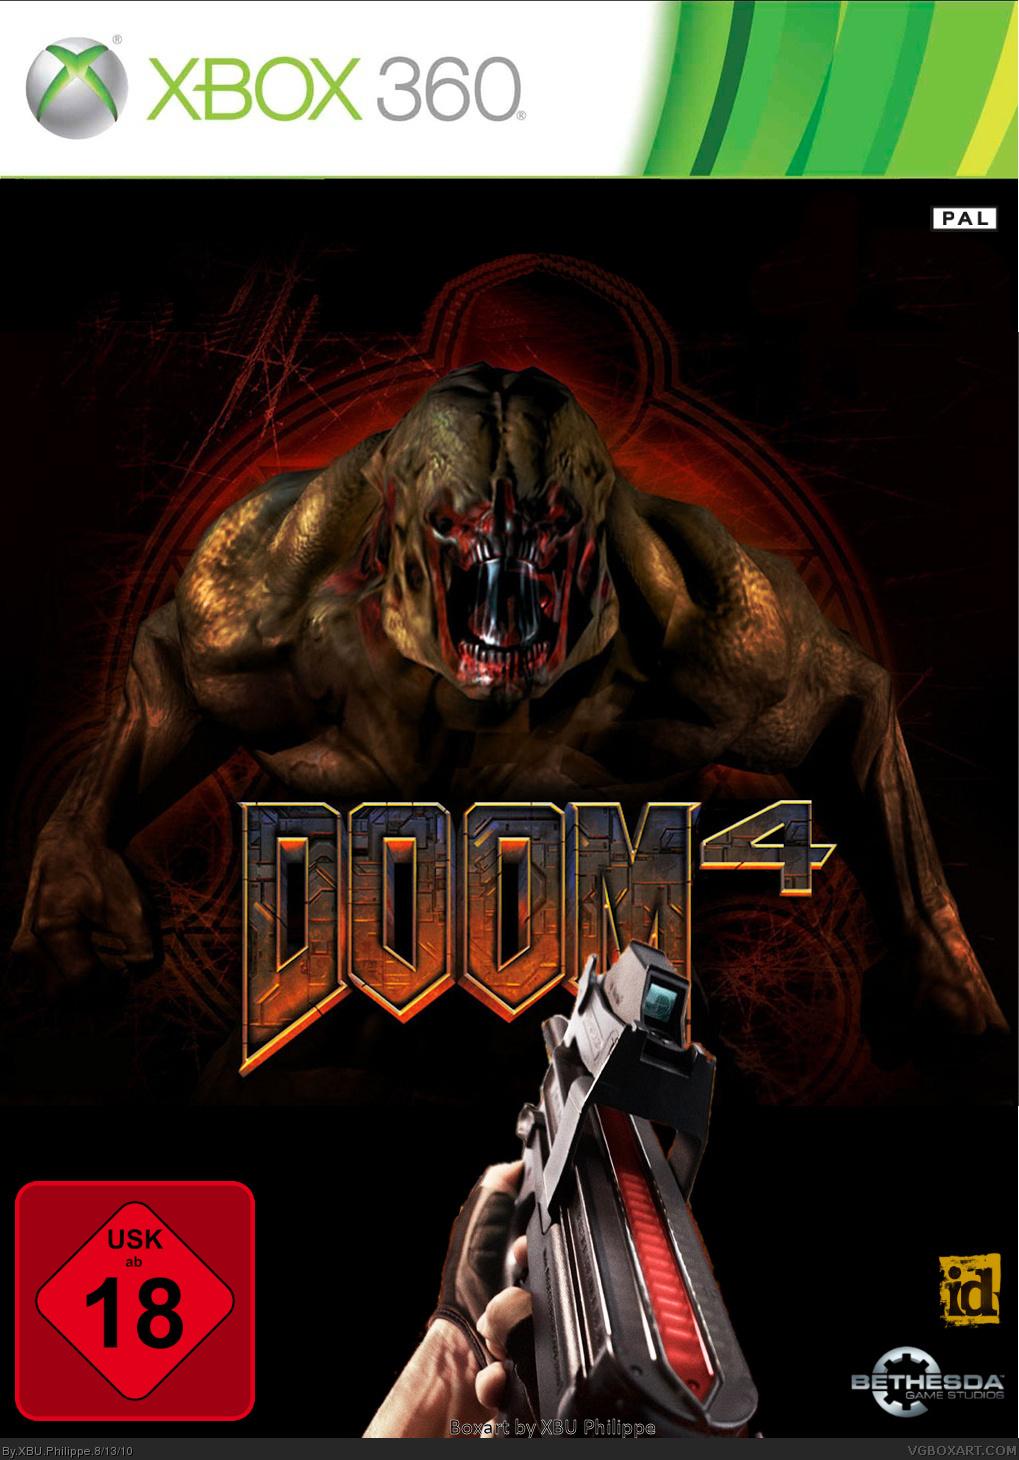 Doom 4 Xbox 360 Box Art Cover By XBU Philippe